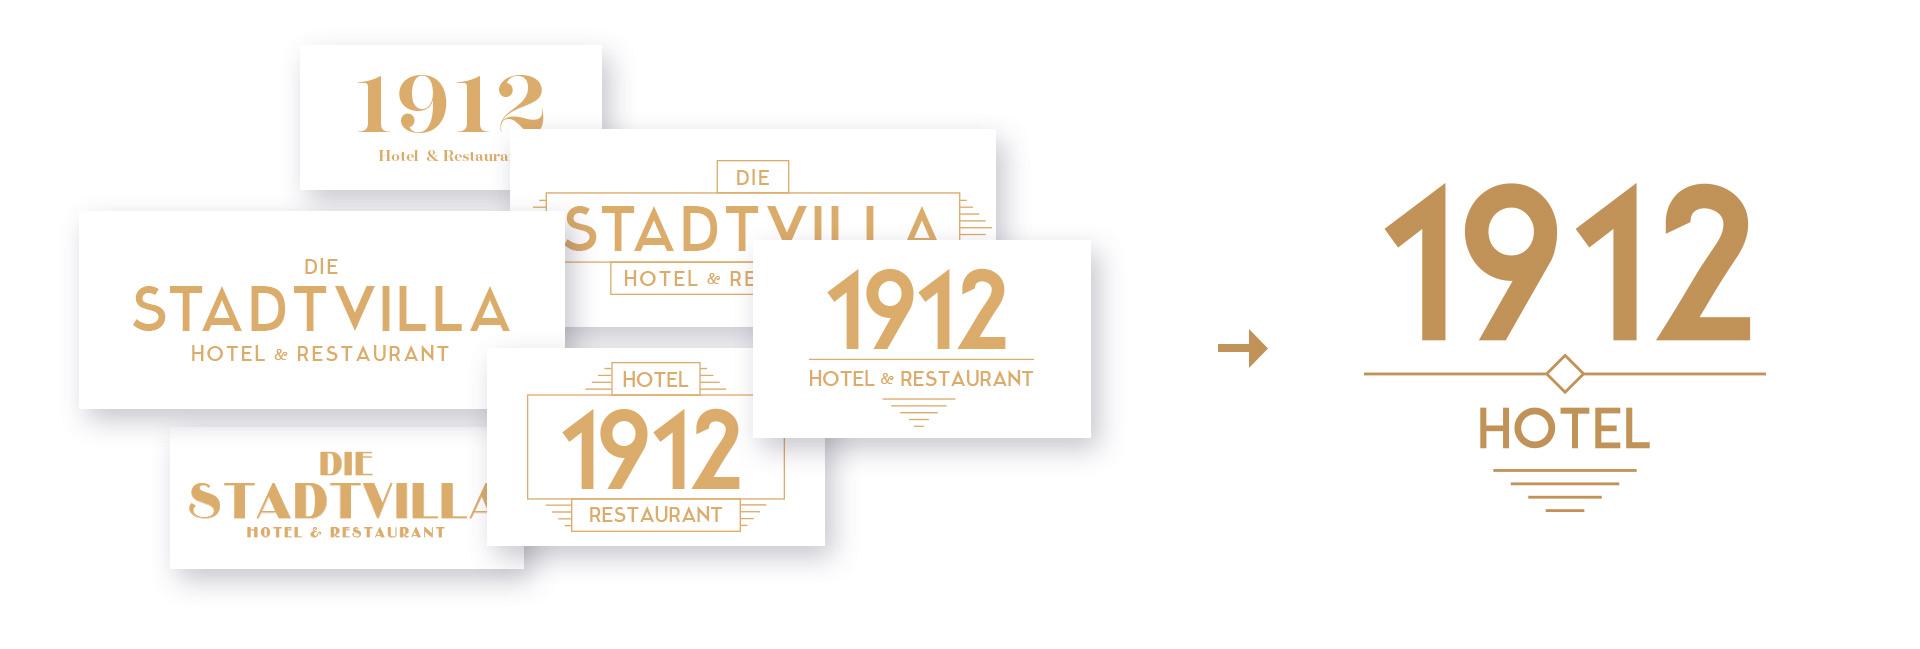 1912 Hotel – Logo